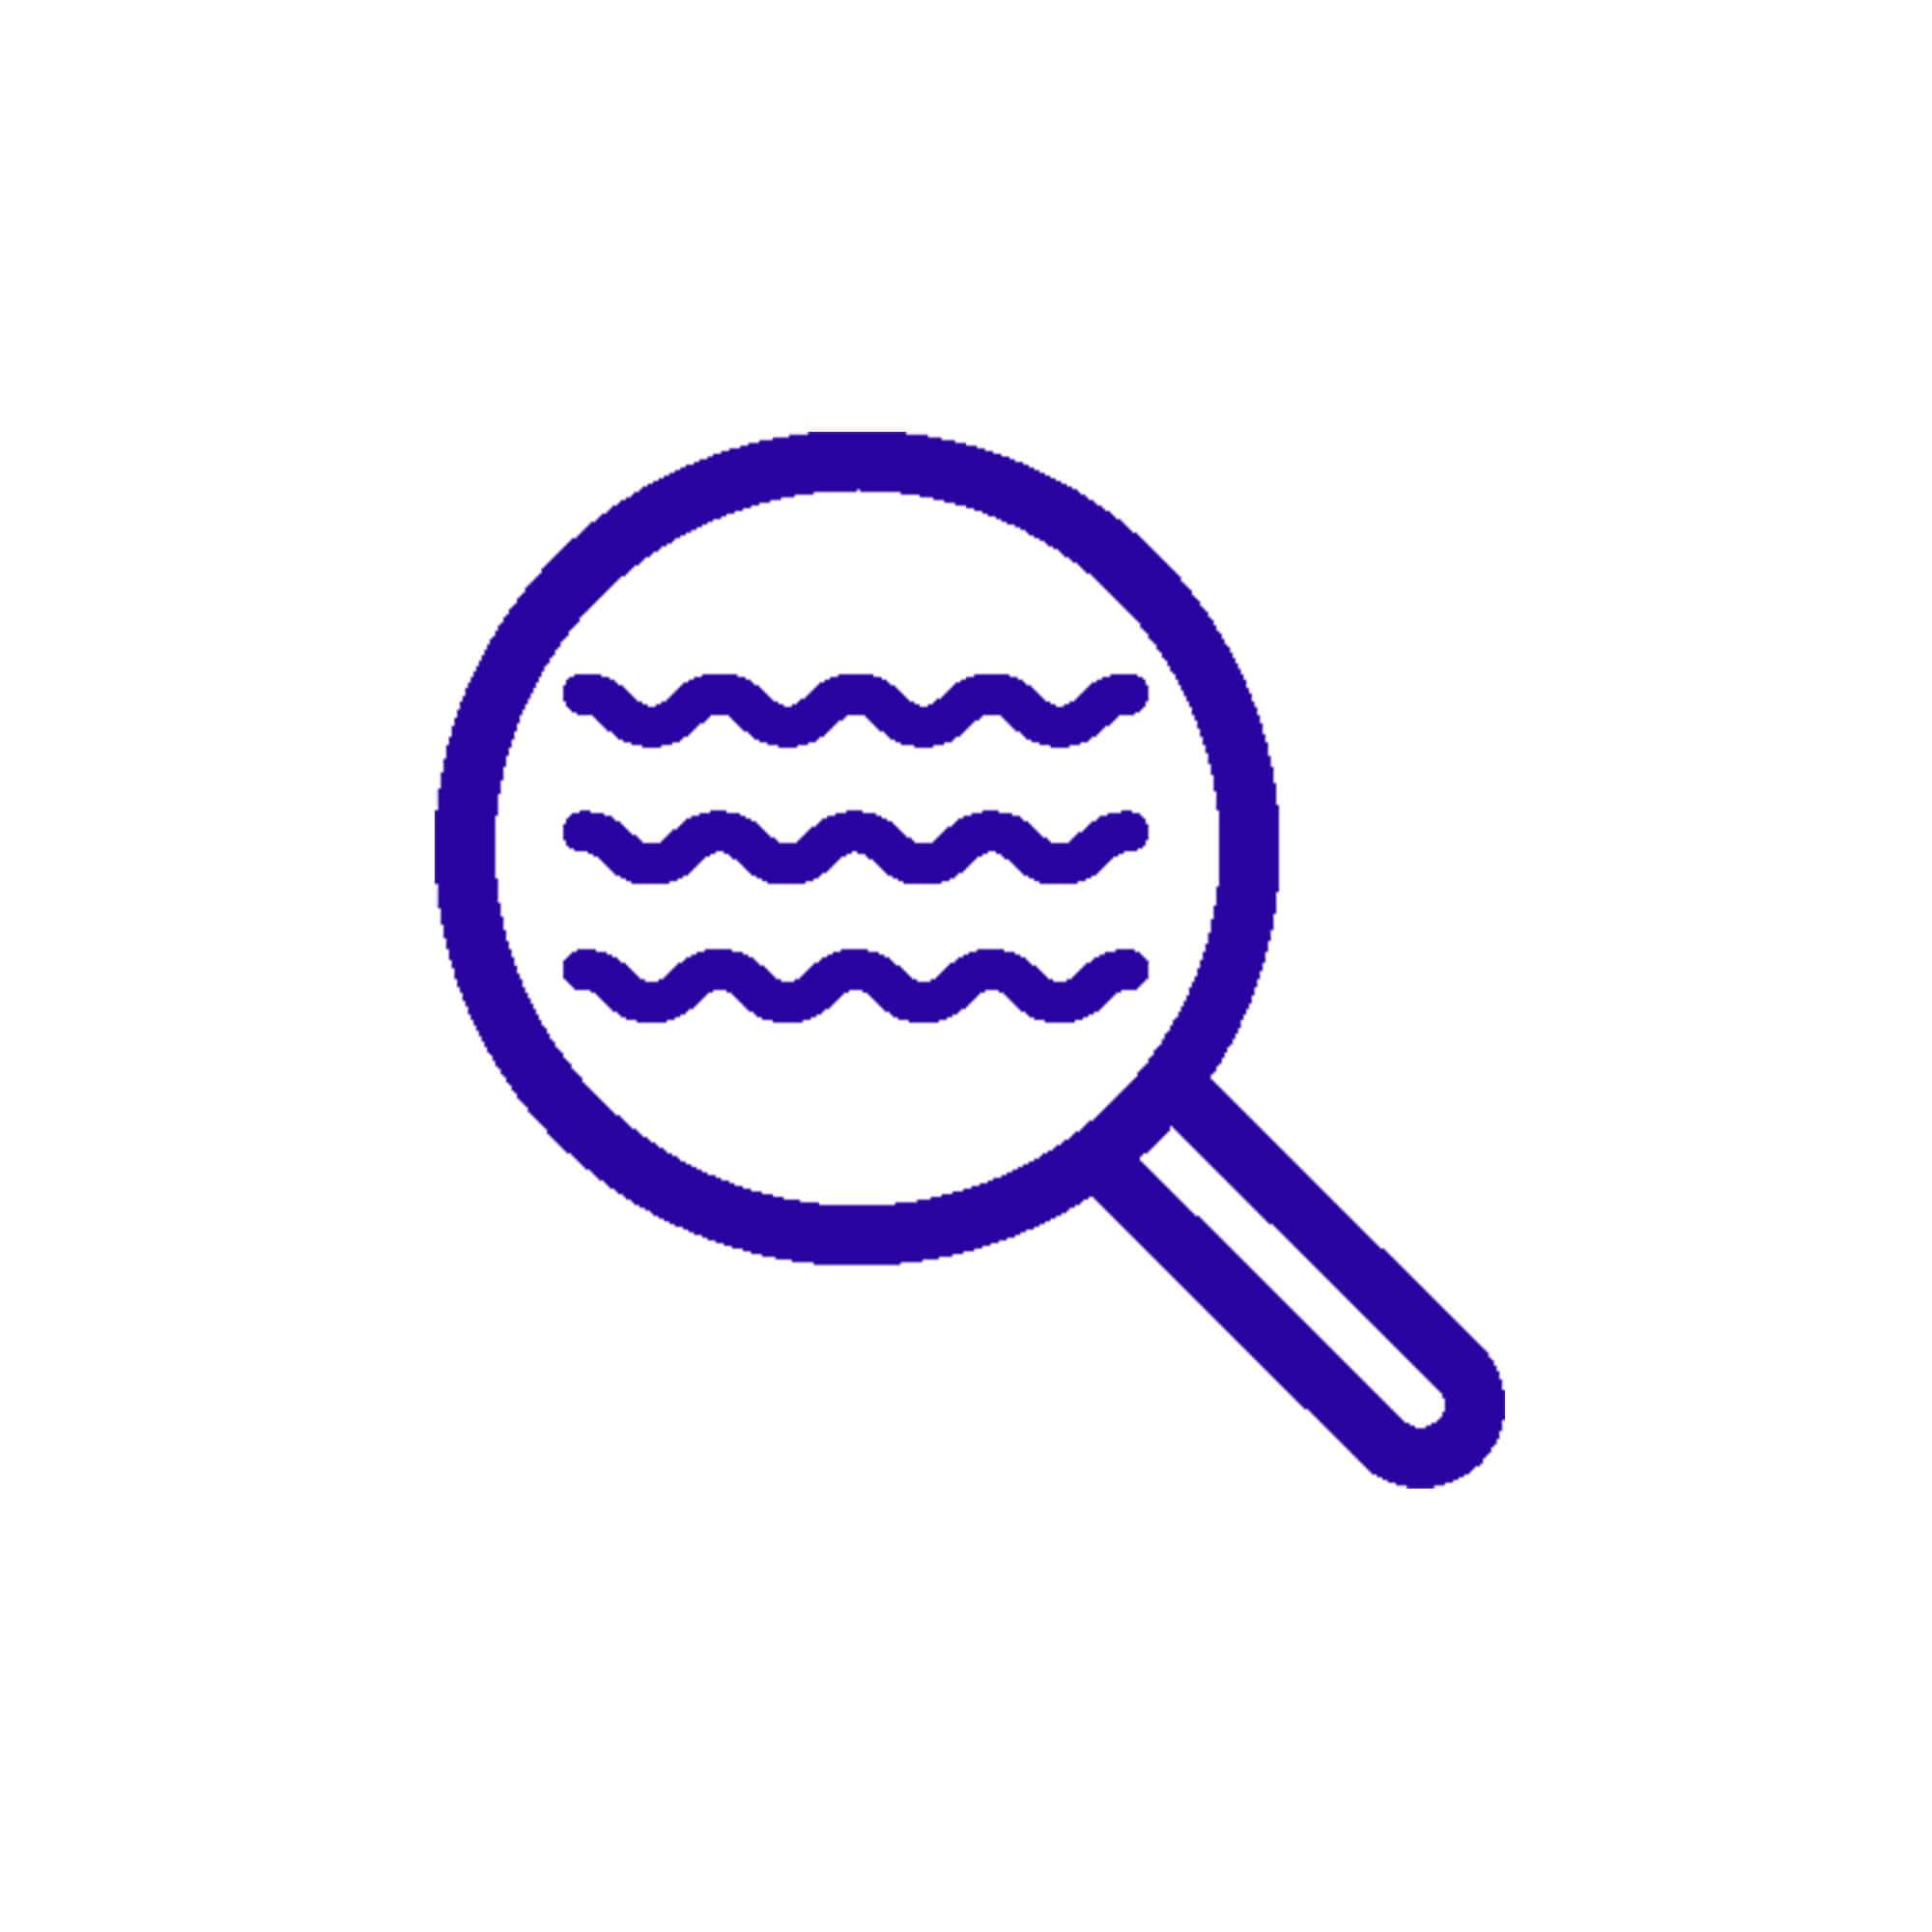 flooding detection icon